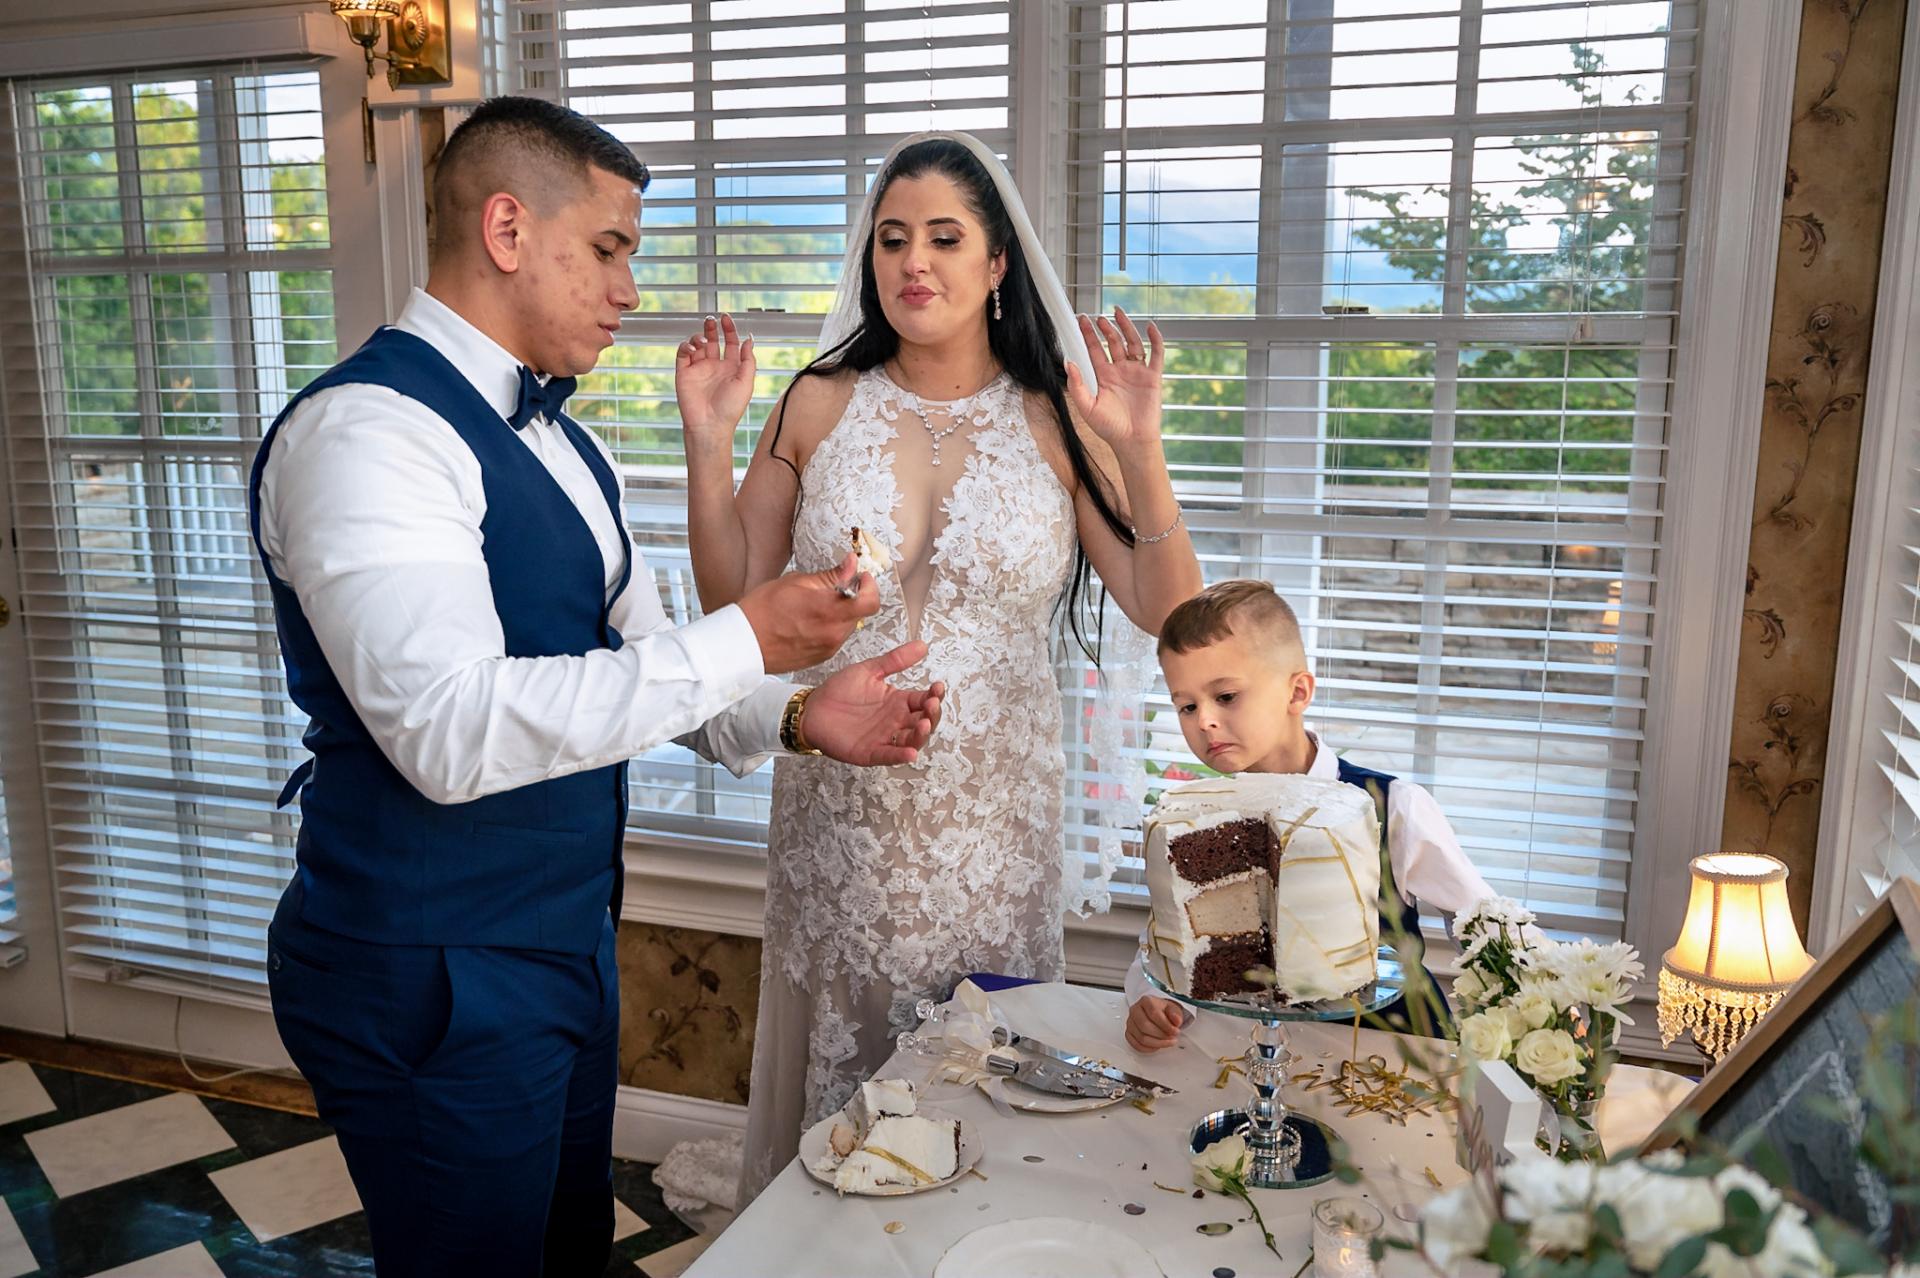 Fotógrafo de bodas de Hippensteal's Mountain View Inn | Durante el corte del bizcocho